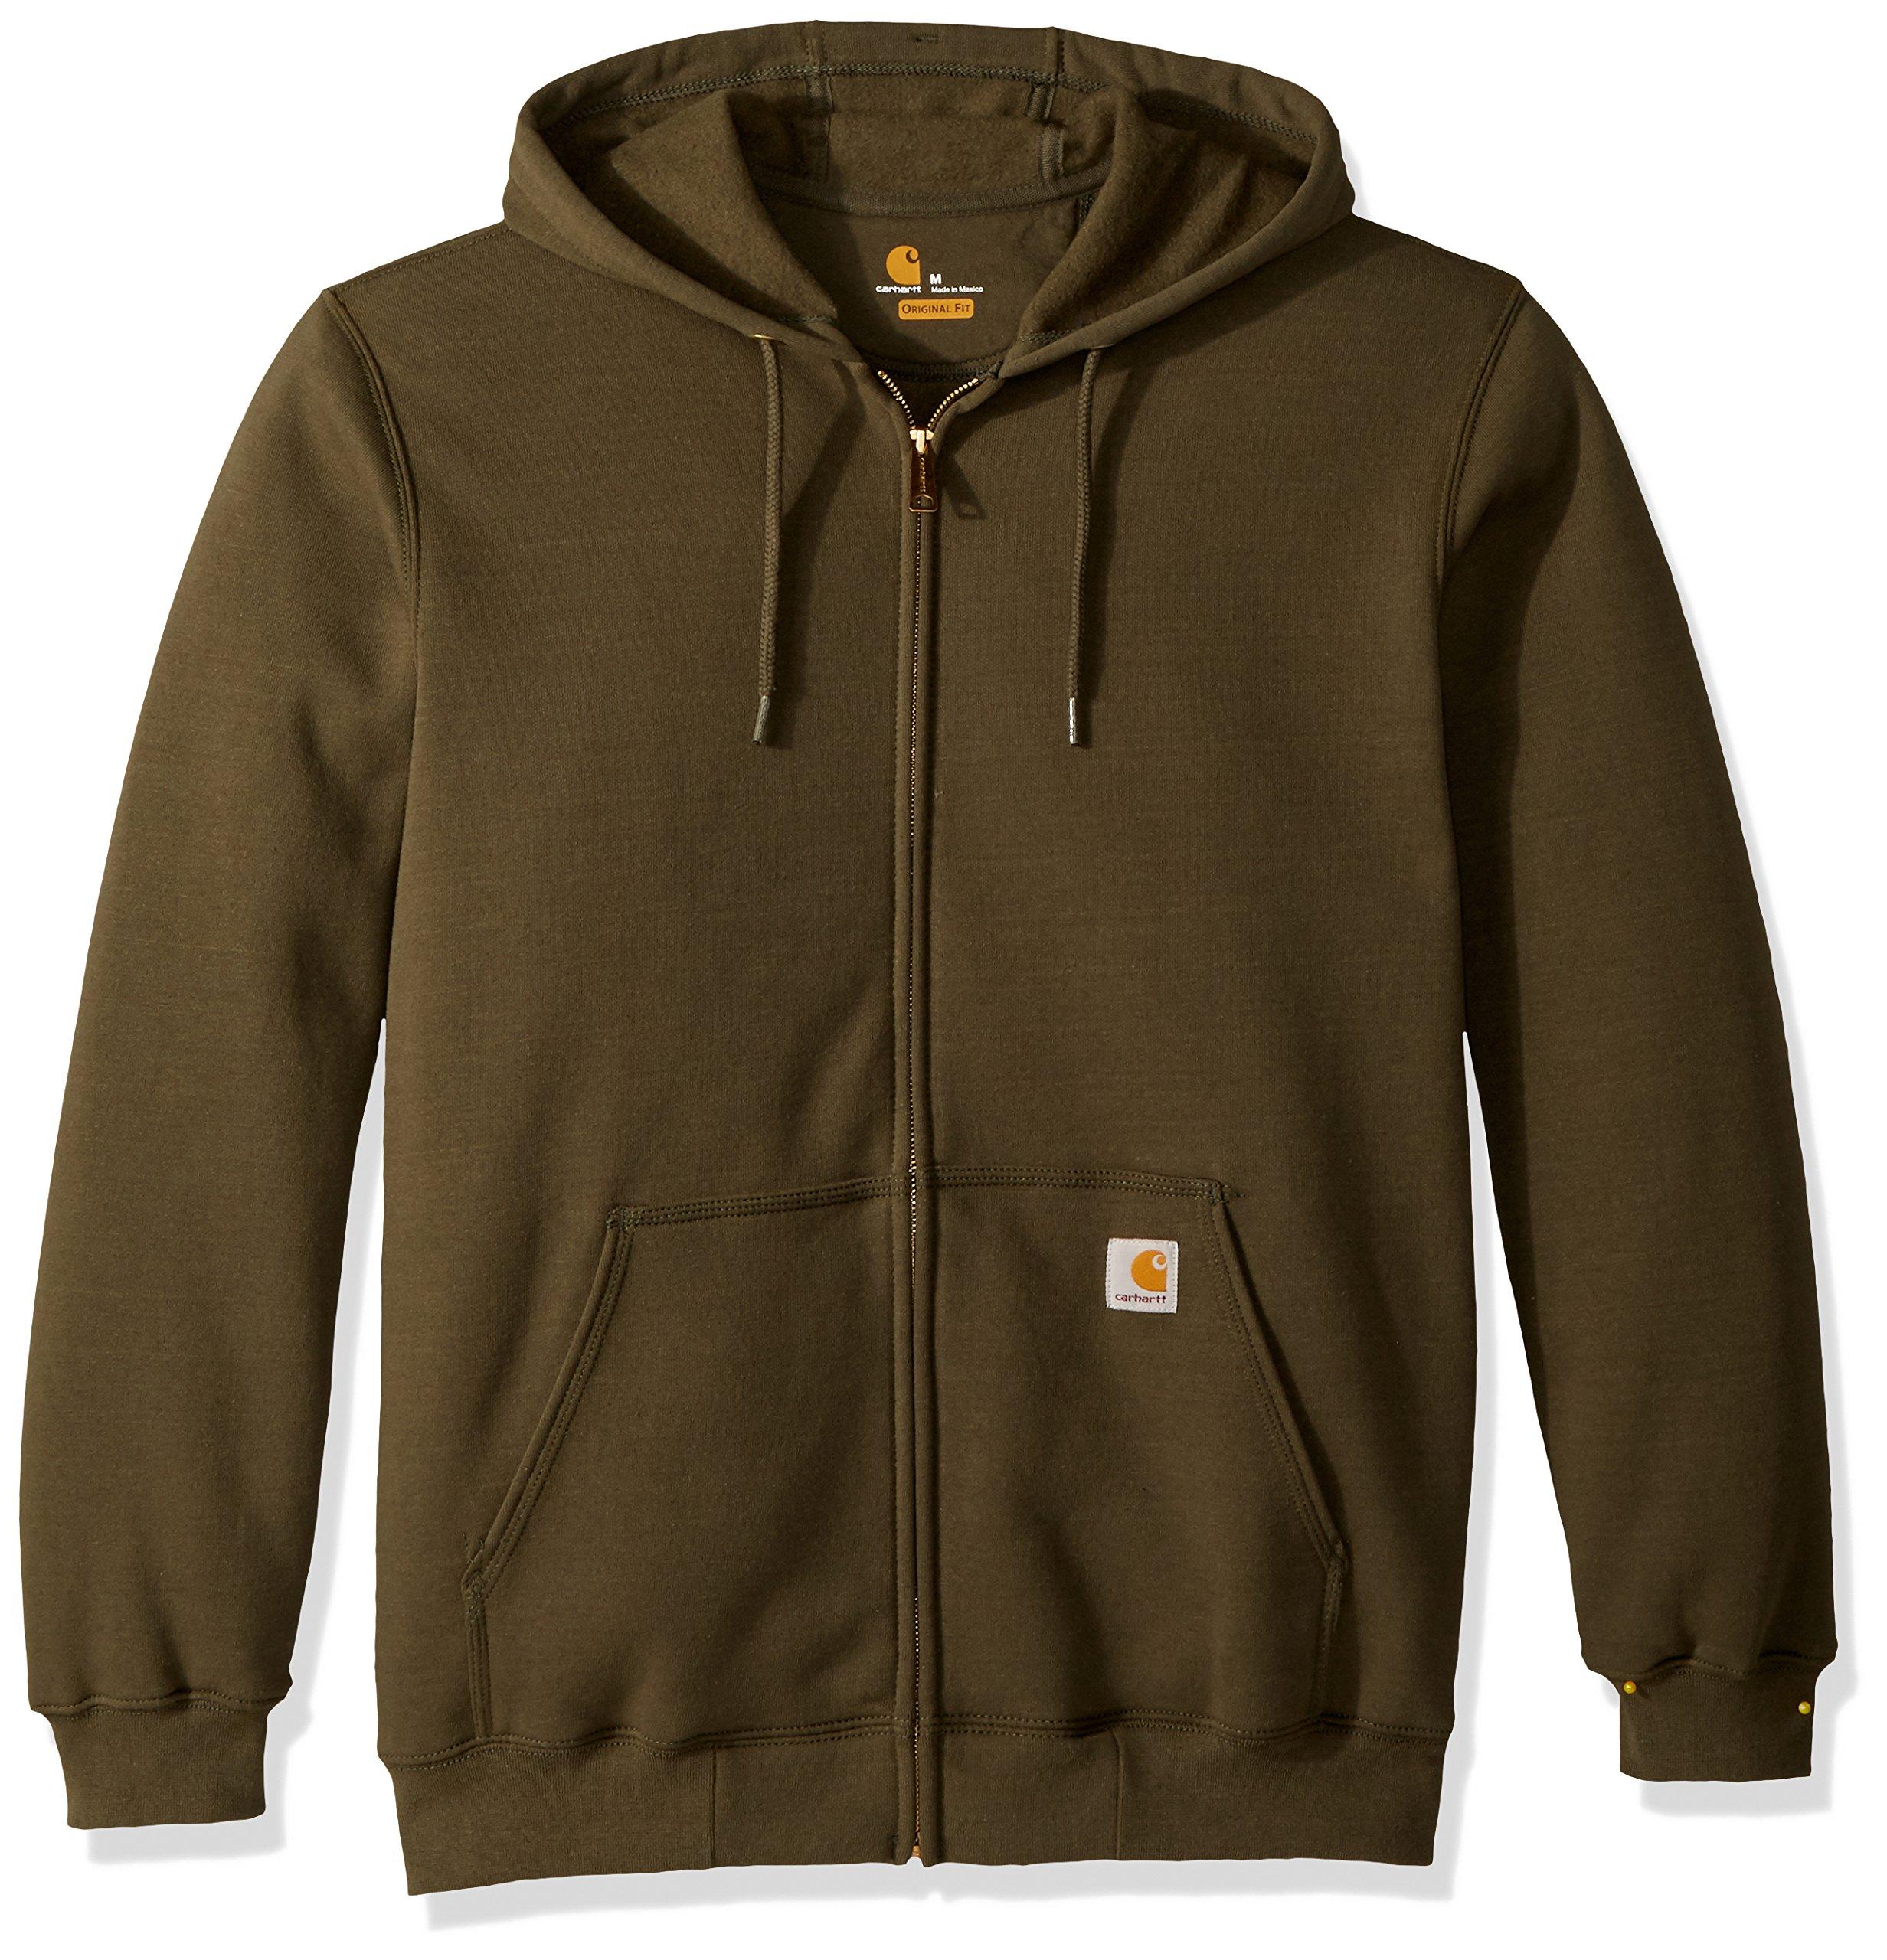 Carhartt Mens Midweight Hooded Zip-Front Sweatshirt,Dark Brown,Medium